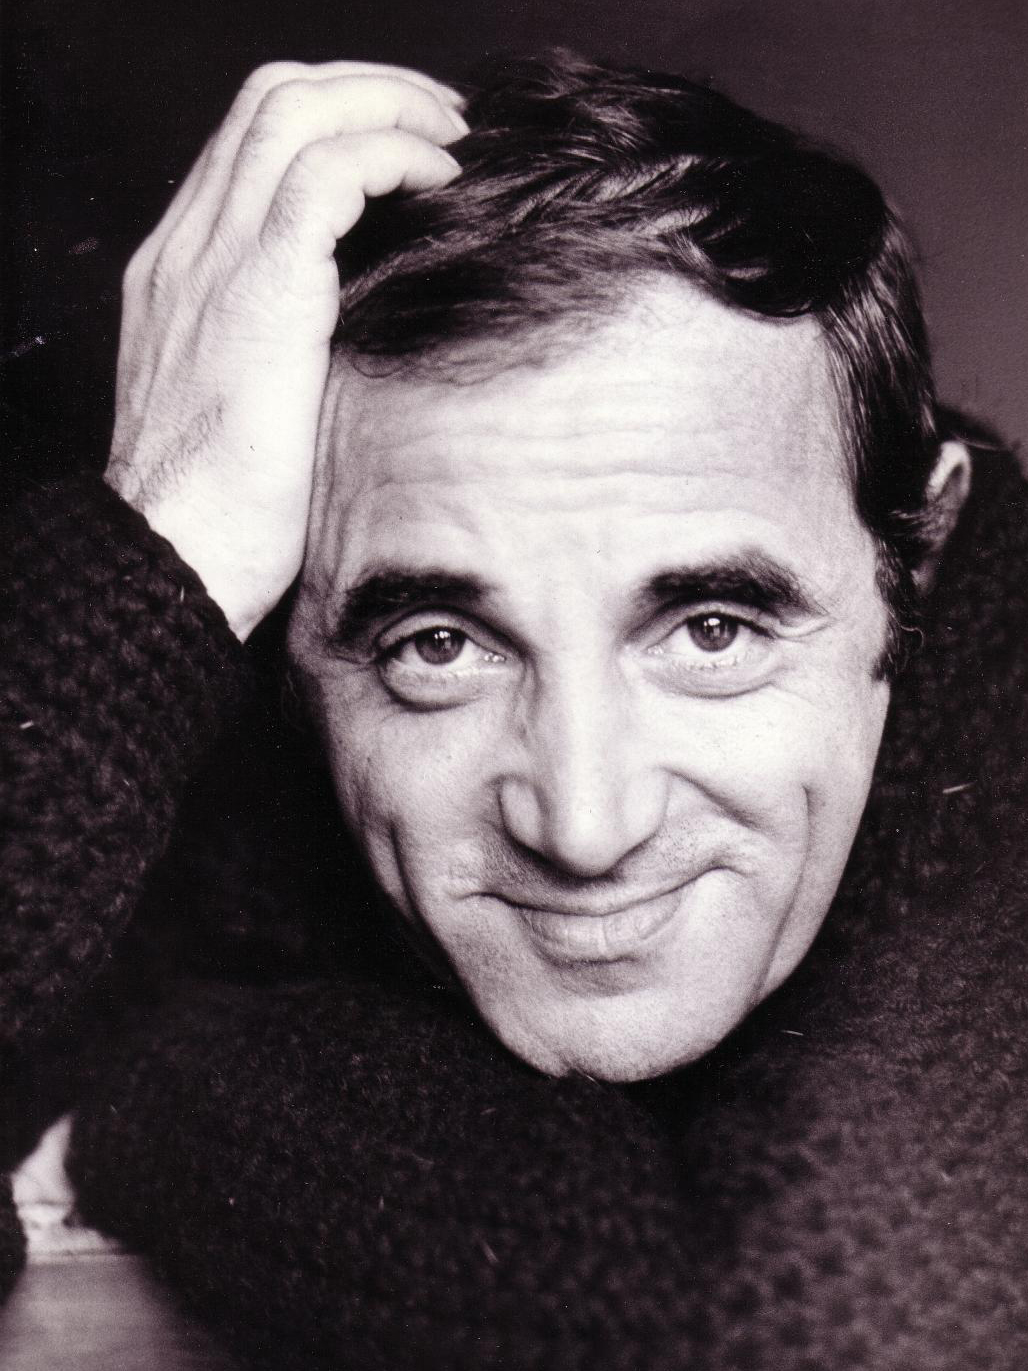 Black and white image of Charles Aznavour